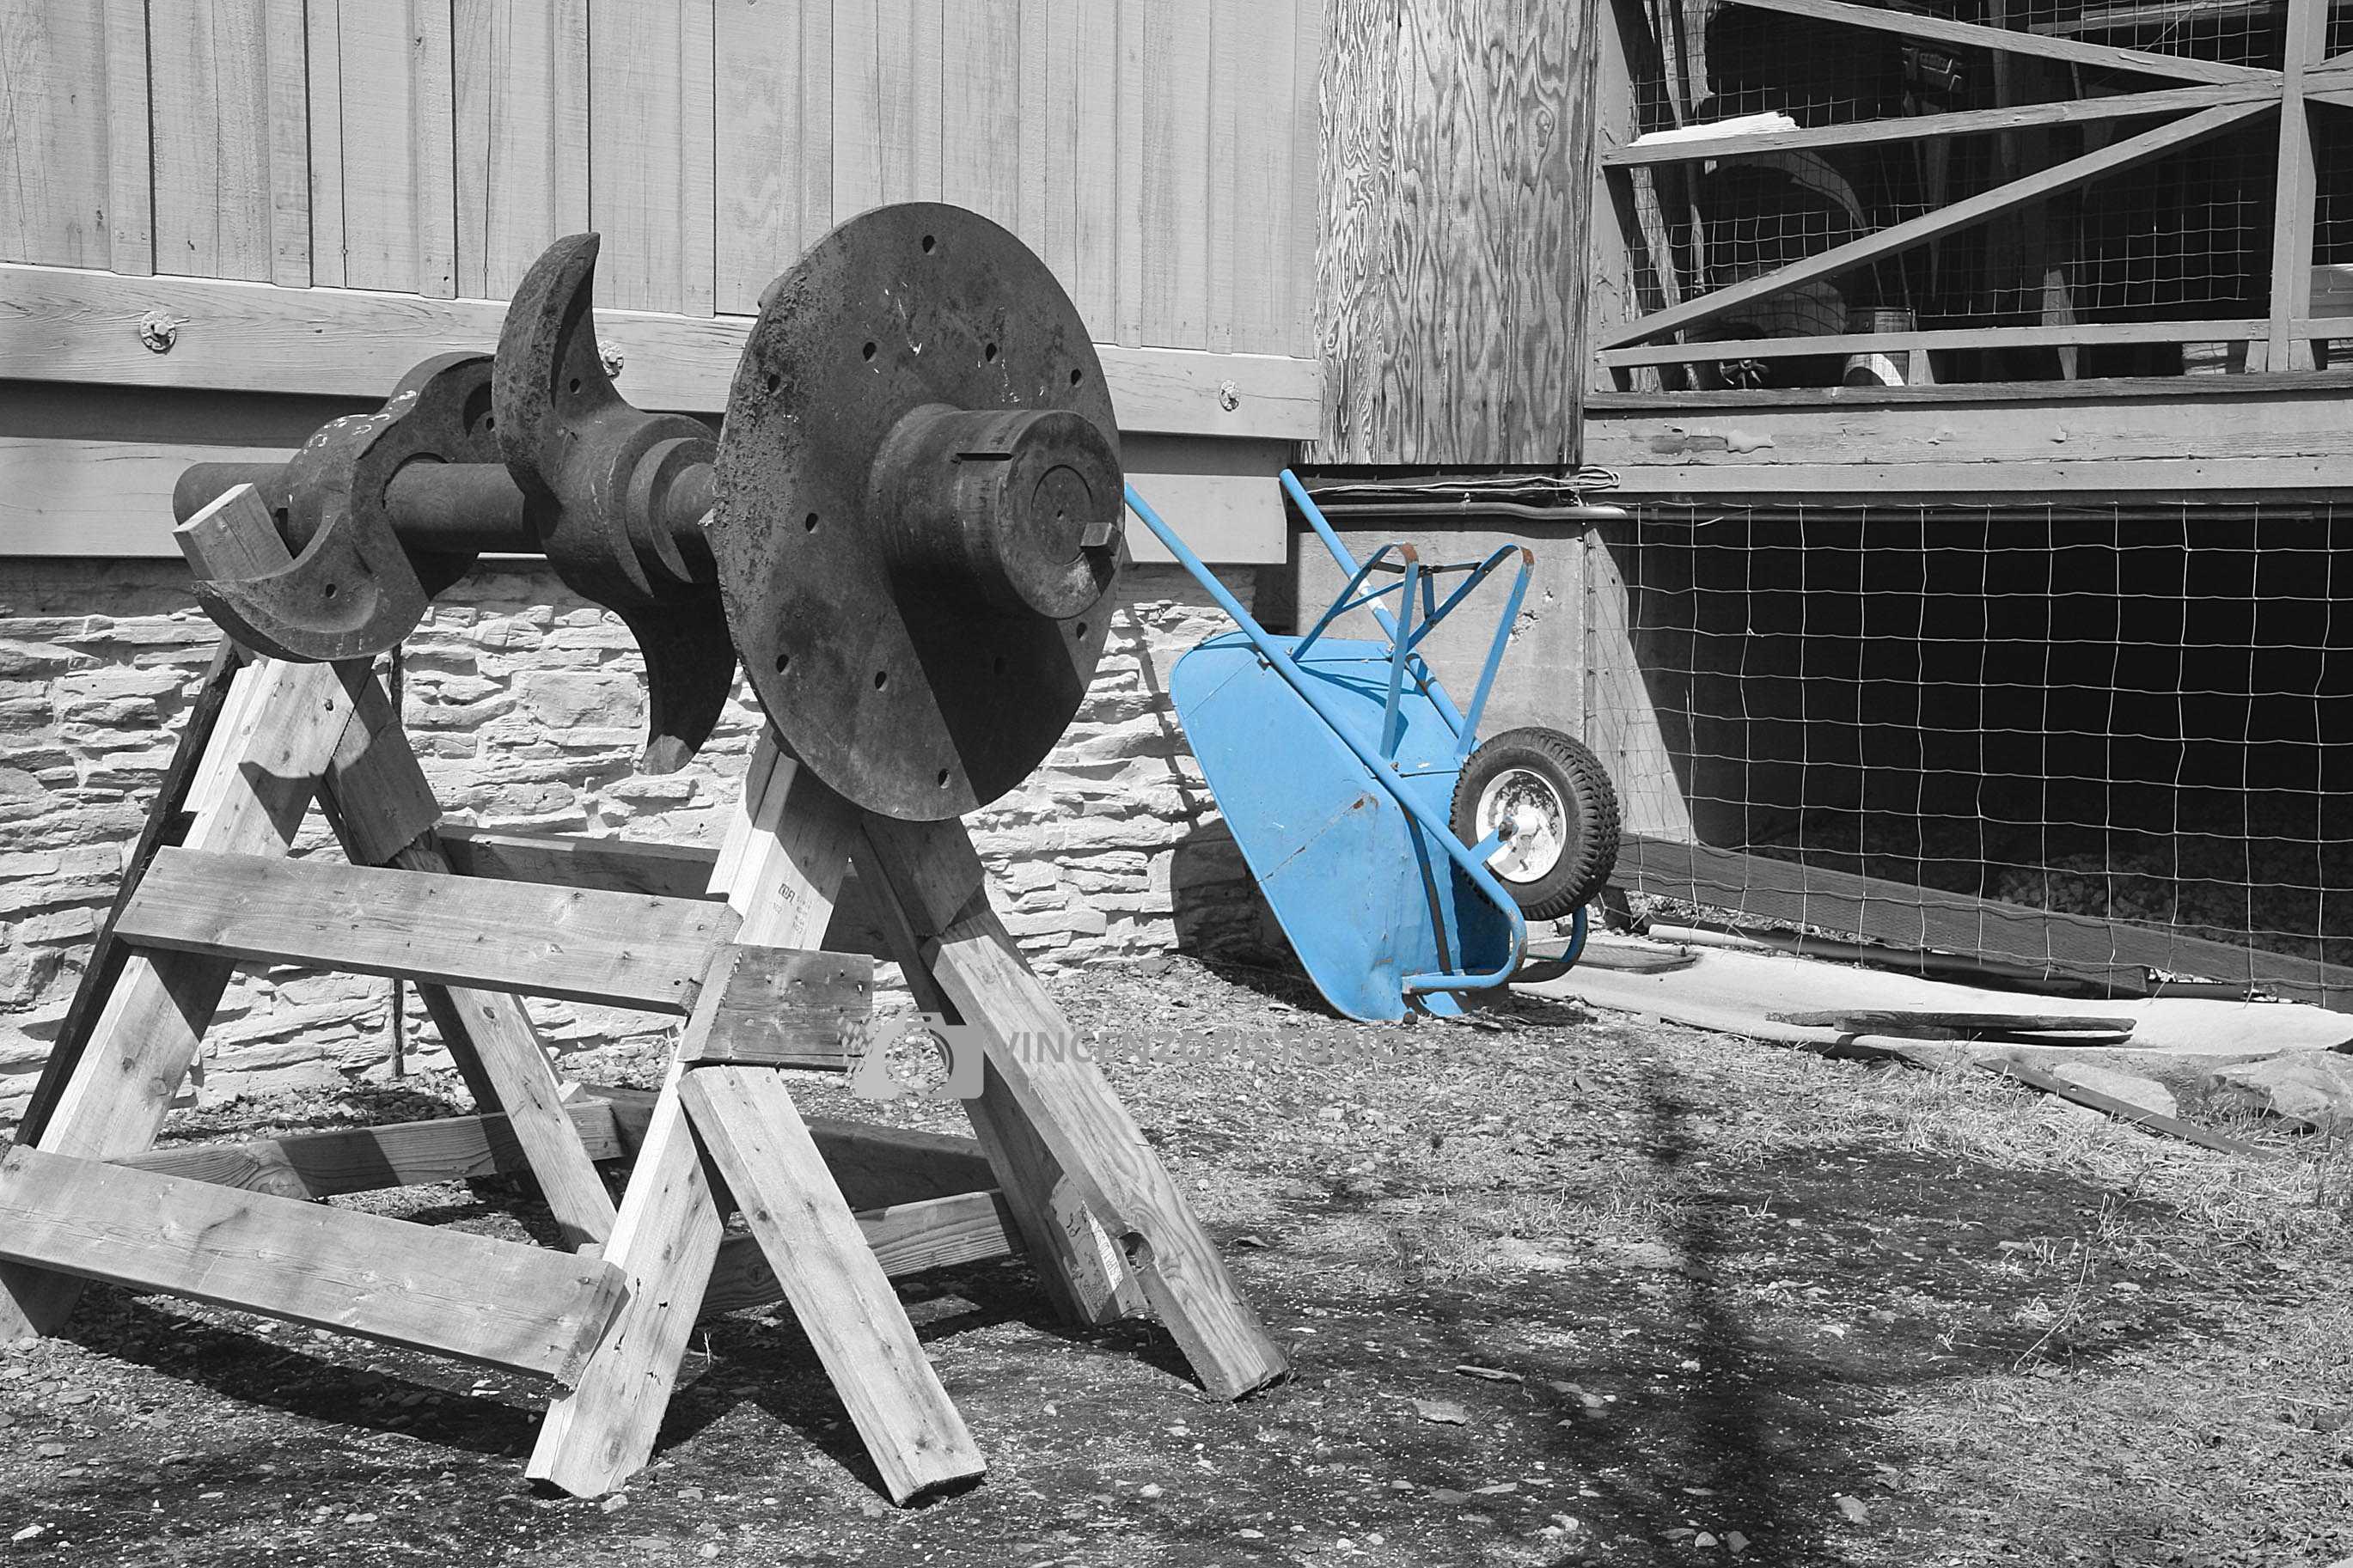 Azure wheelbarrow in Mariposa museum – BW